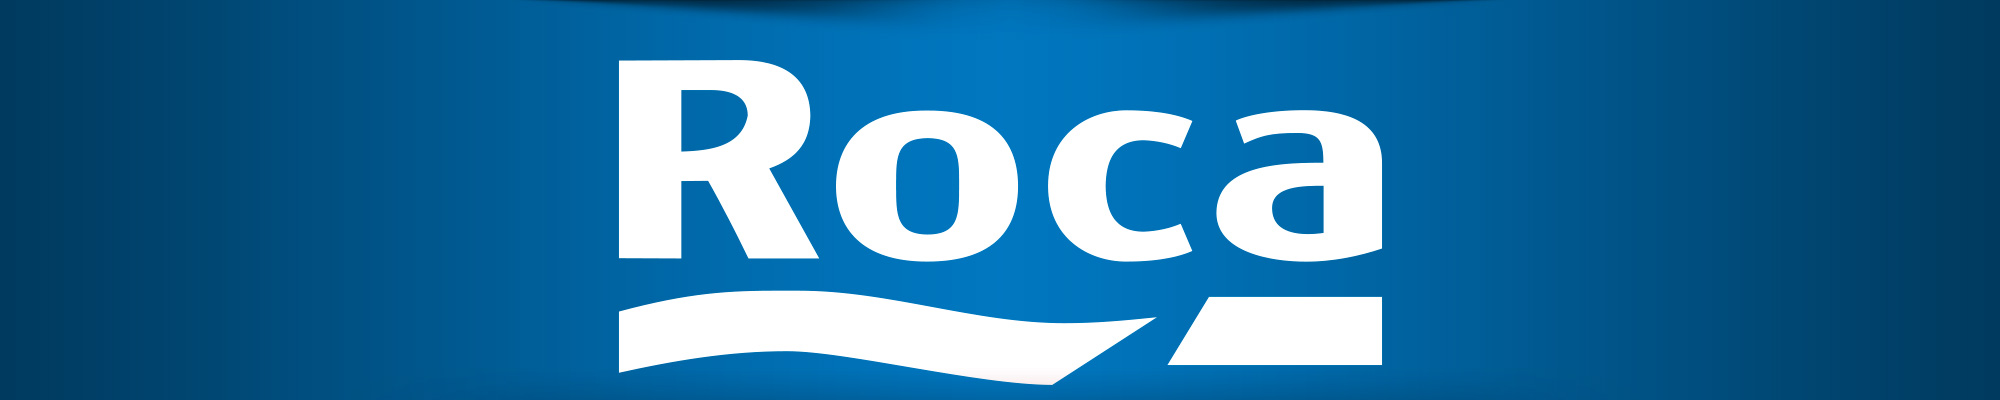 servicio t cnico roca en mallorca